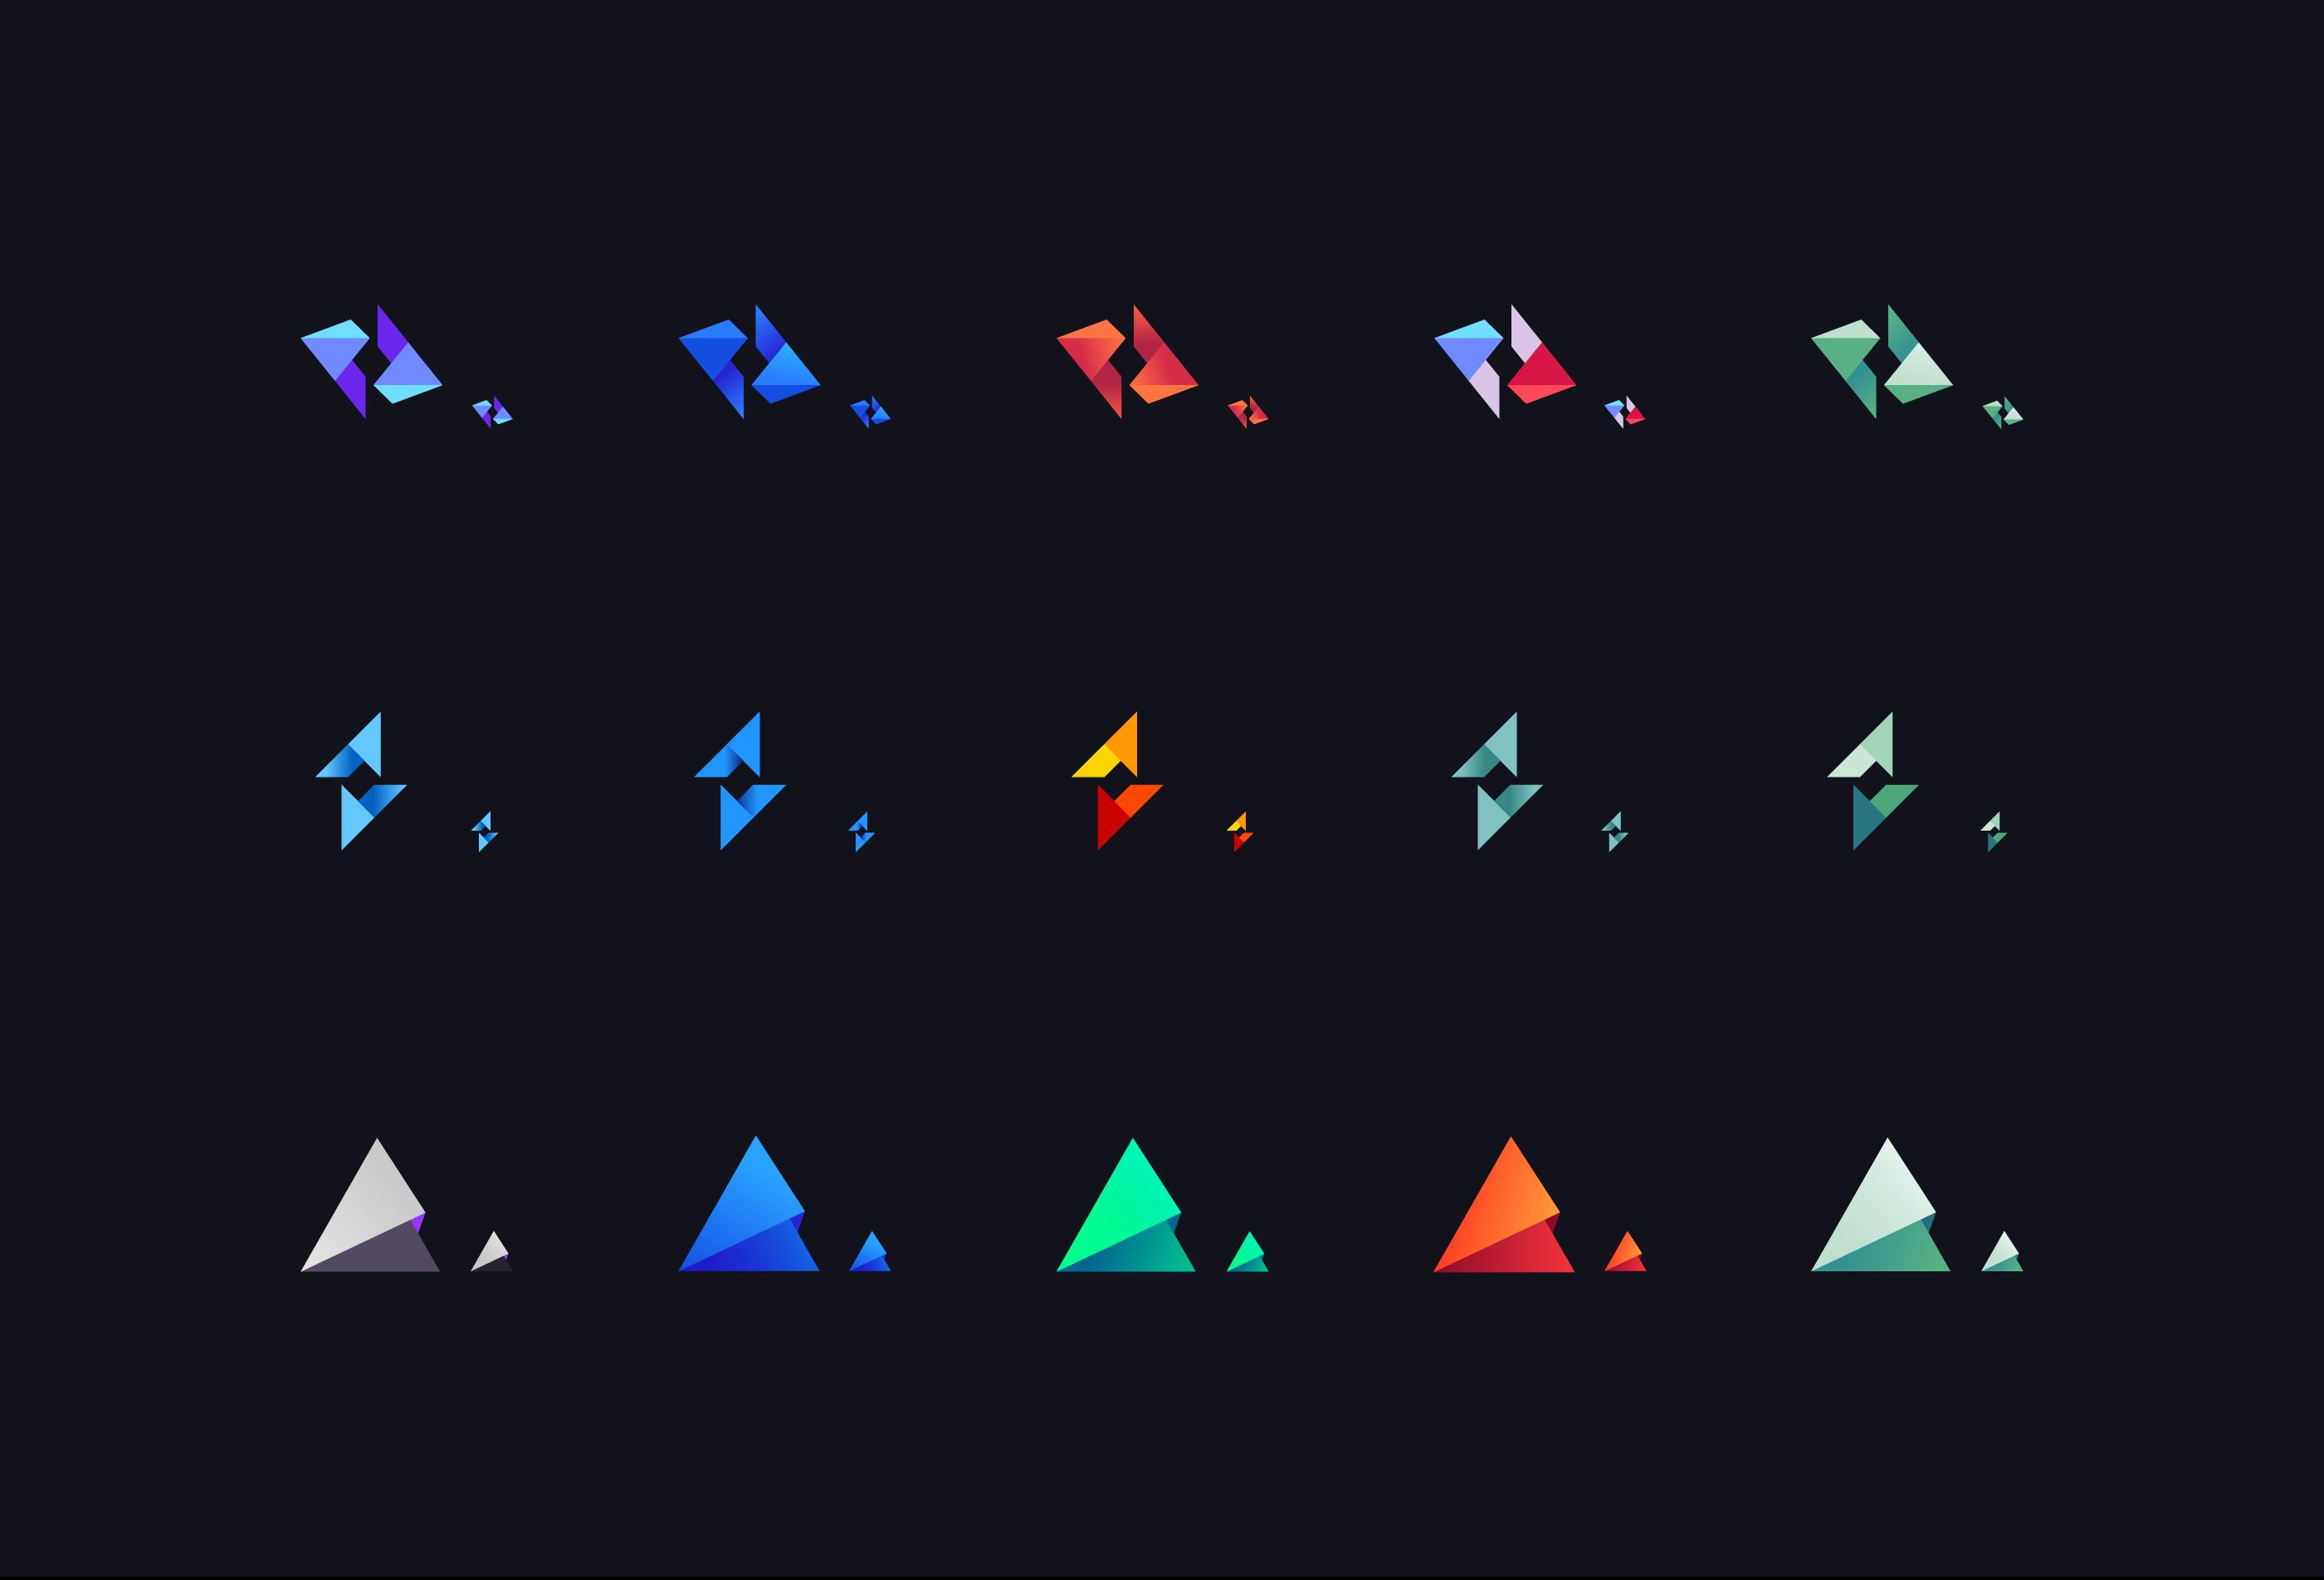 kyber network logo options